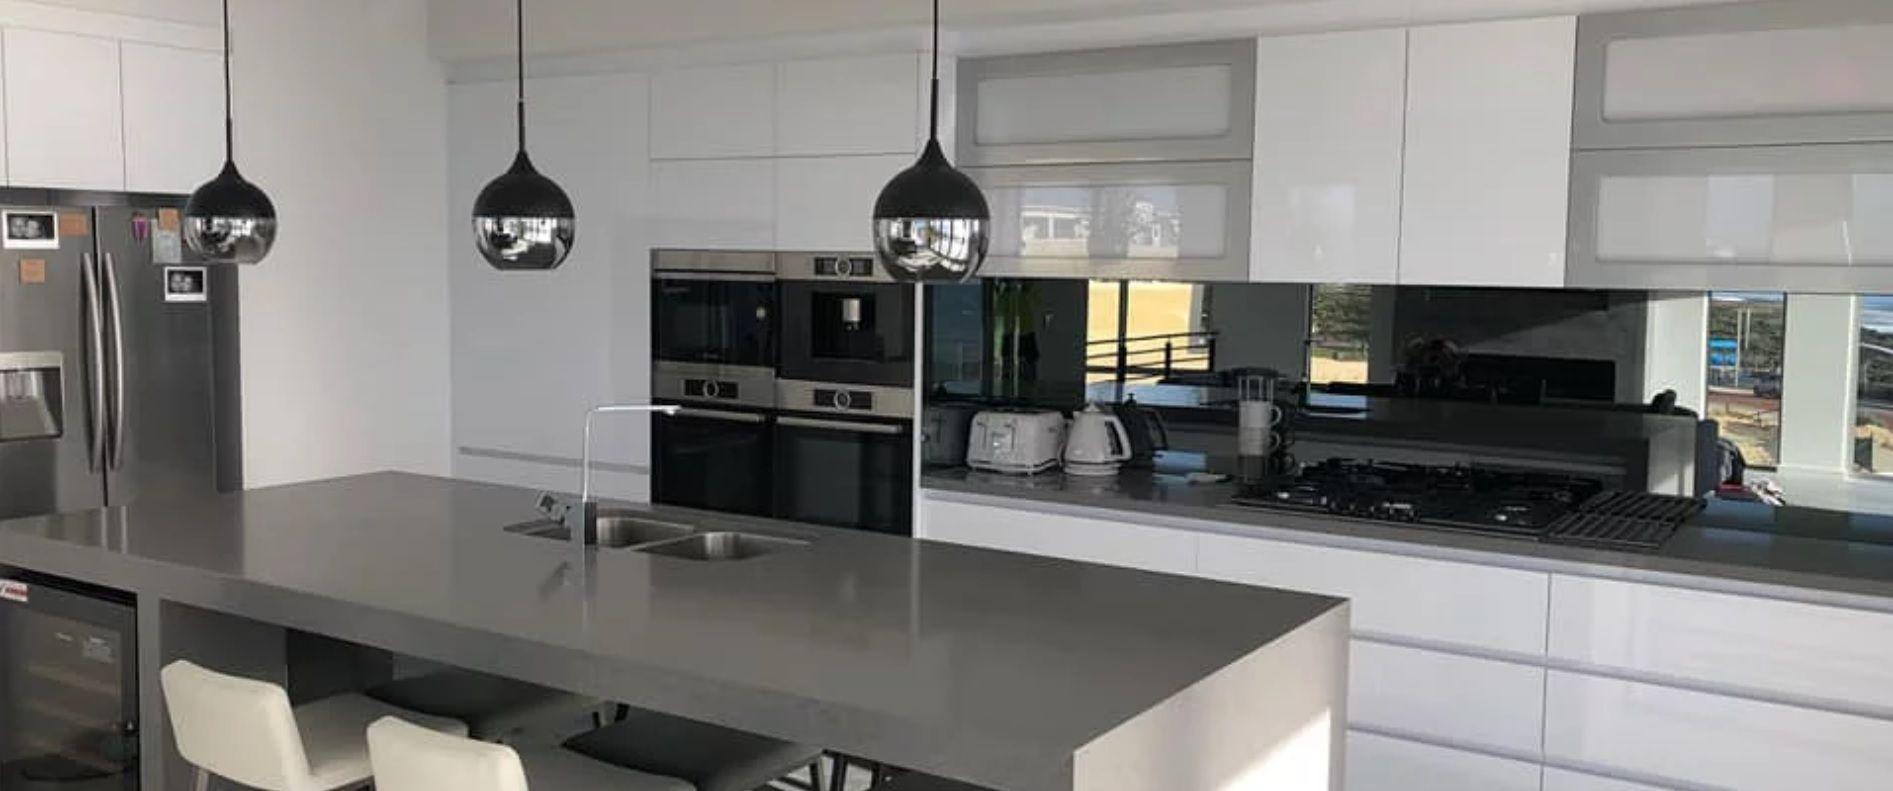 Kitchen Cabinet Manufacturers Perth